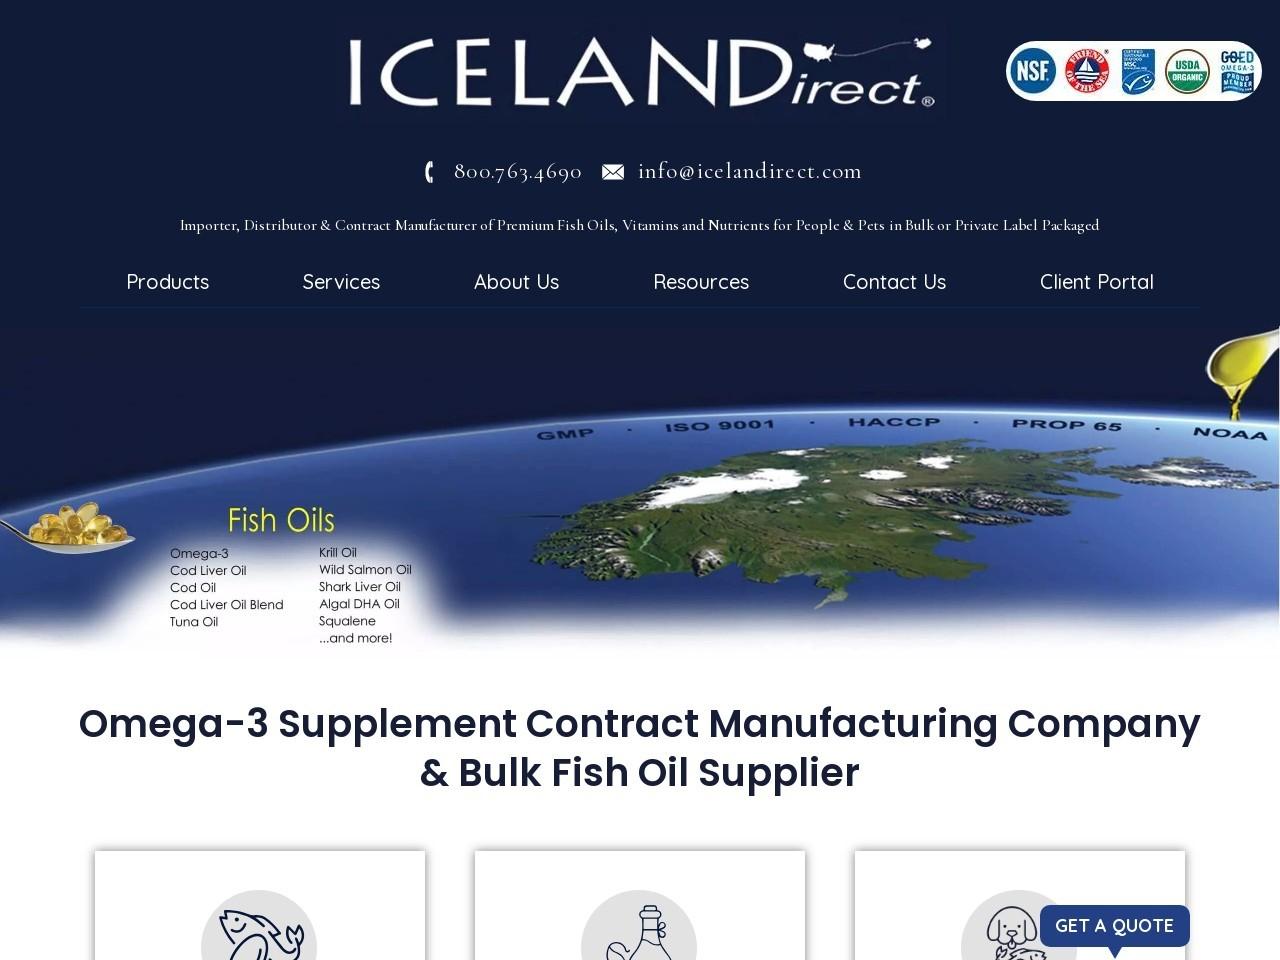 Vegan Omega 3 Supplement | Icelandirect